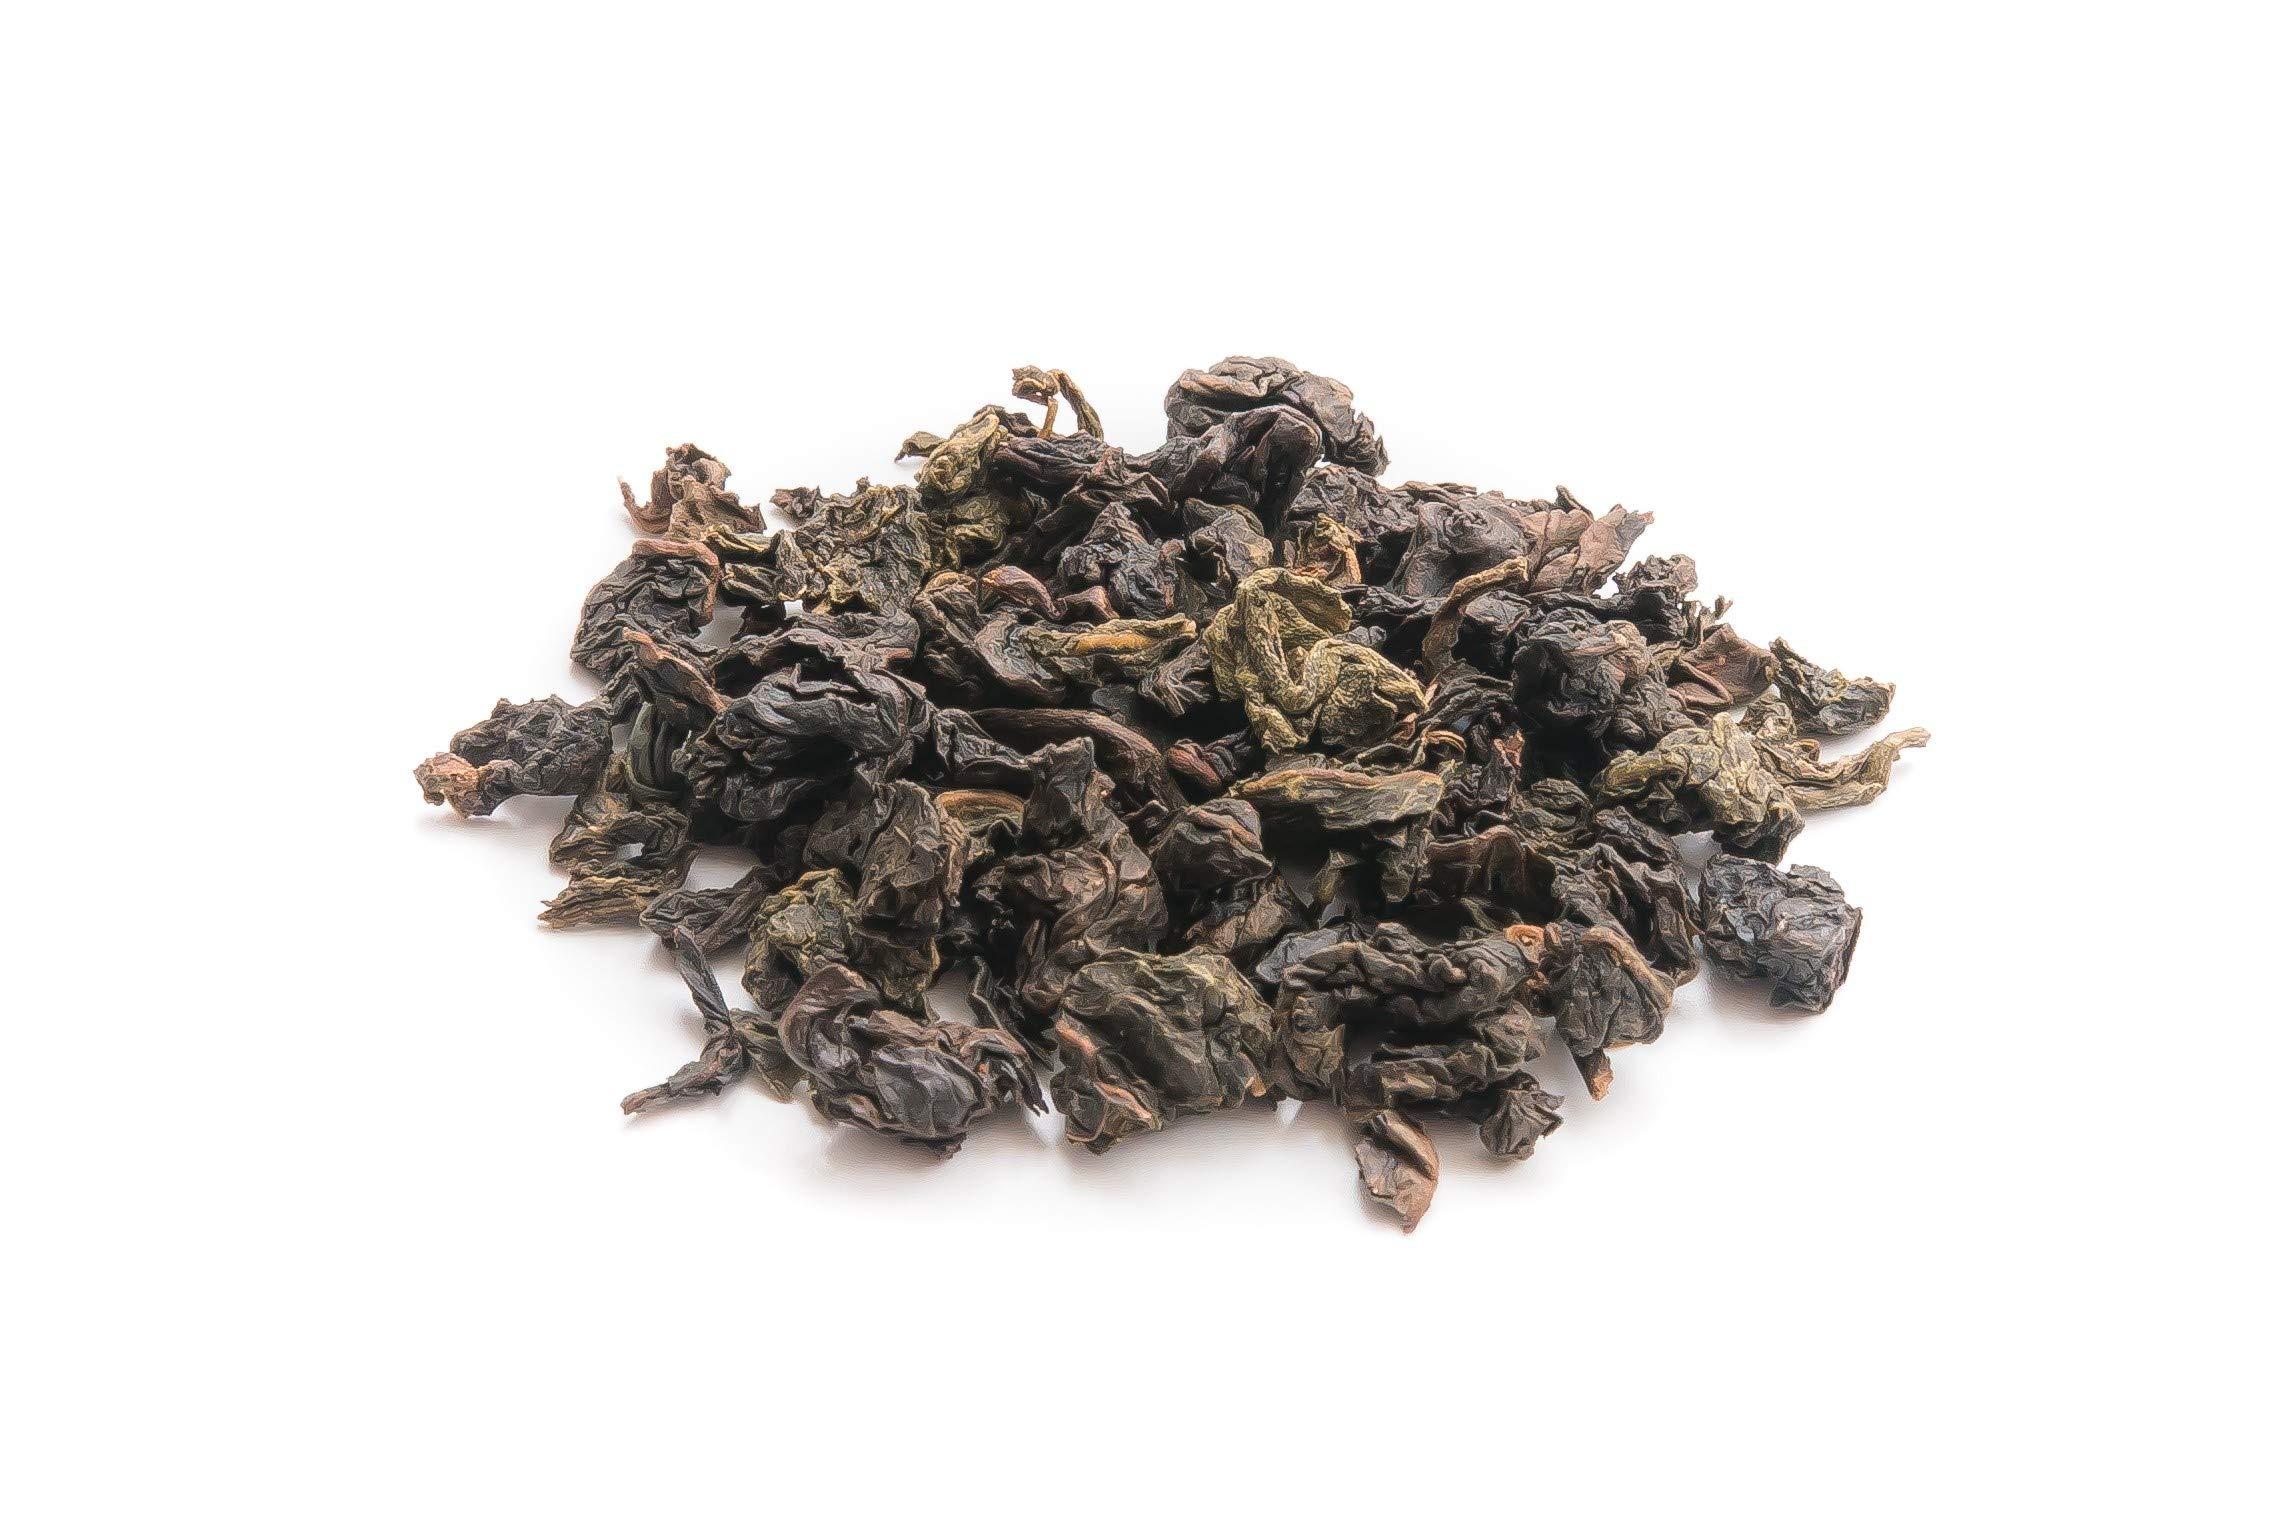 Shangri-La Tea Company Loose Leaf Tea, Se Chung Oolong Black Tea, Roasted Sweet Character, Naturally Caffeinated, Allergen Free, Non-Gmo, 2 Oz